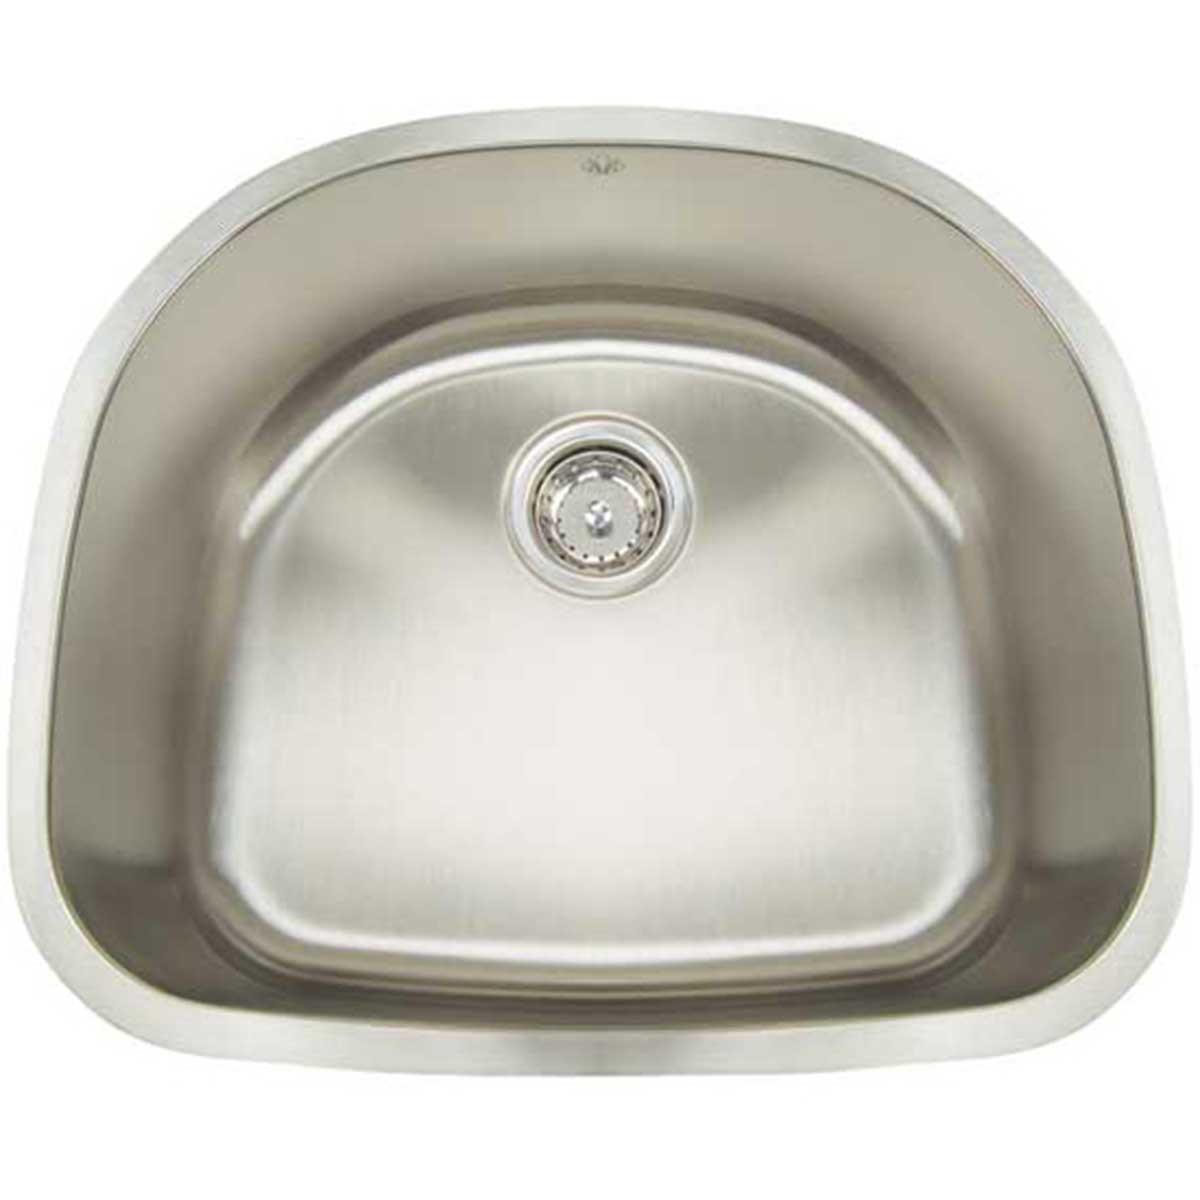 Artisan Sinks 16 Gauge AR2321-D9